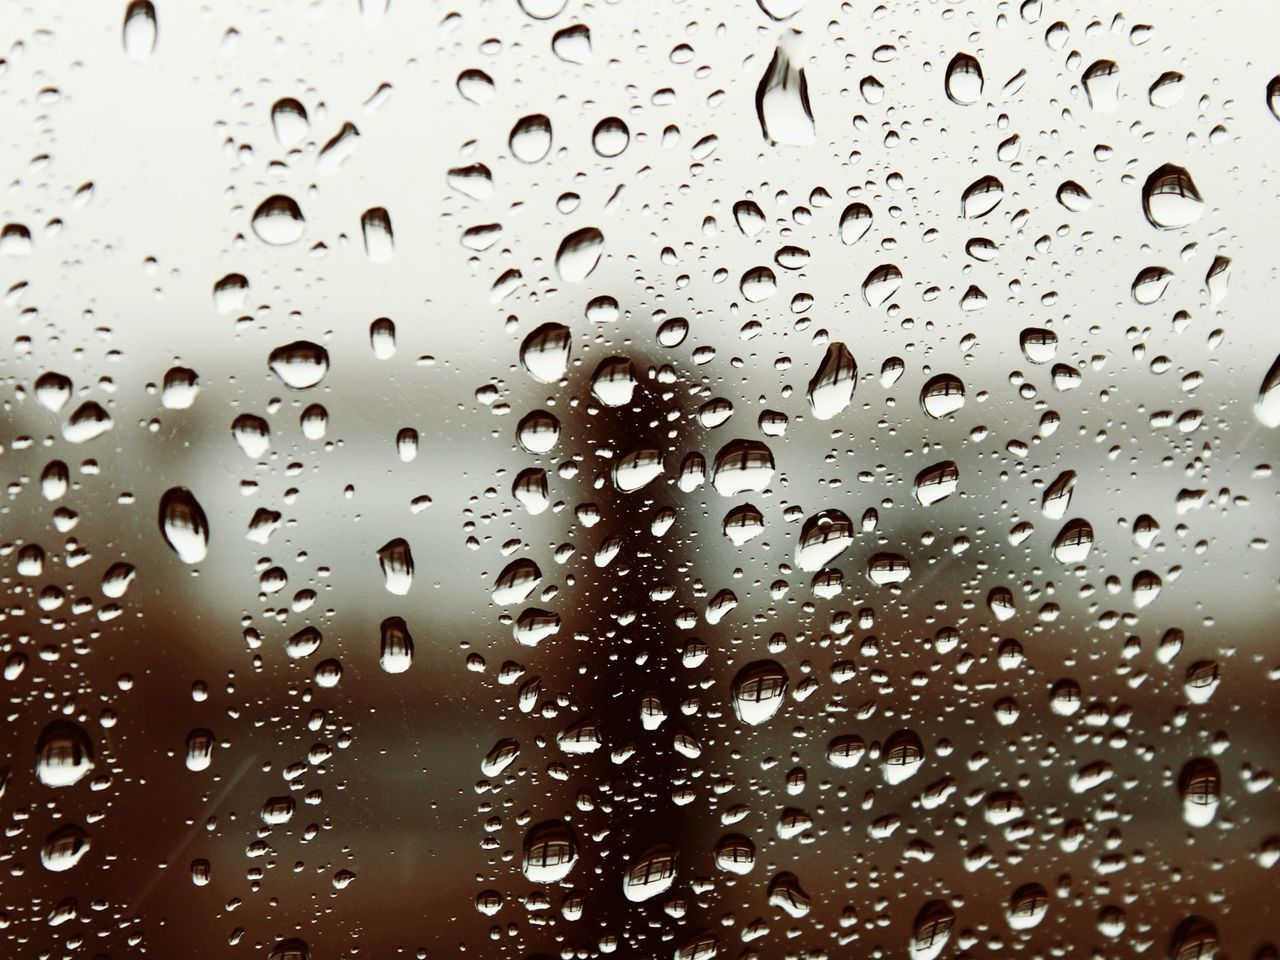 Raindrops #rainyday #water #ferry #relax #skyview #windscreen Droplets Drops Drops Of Rain Rain Drops Water Water Droplets Water Drops Water On Glass First Eyeem Photo